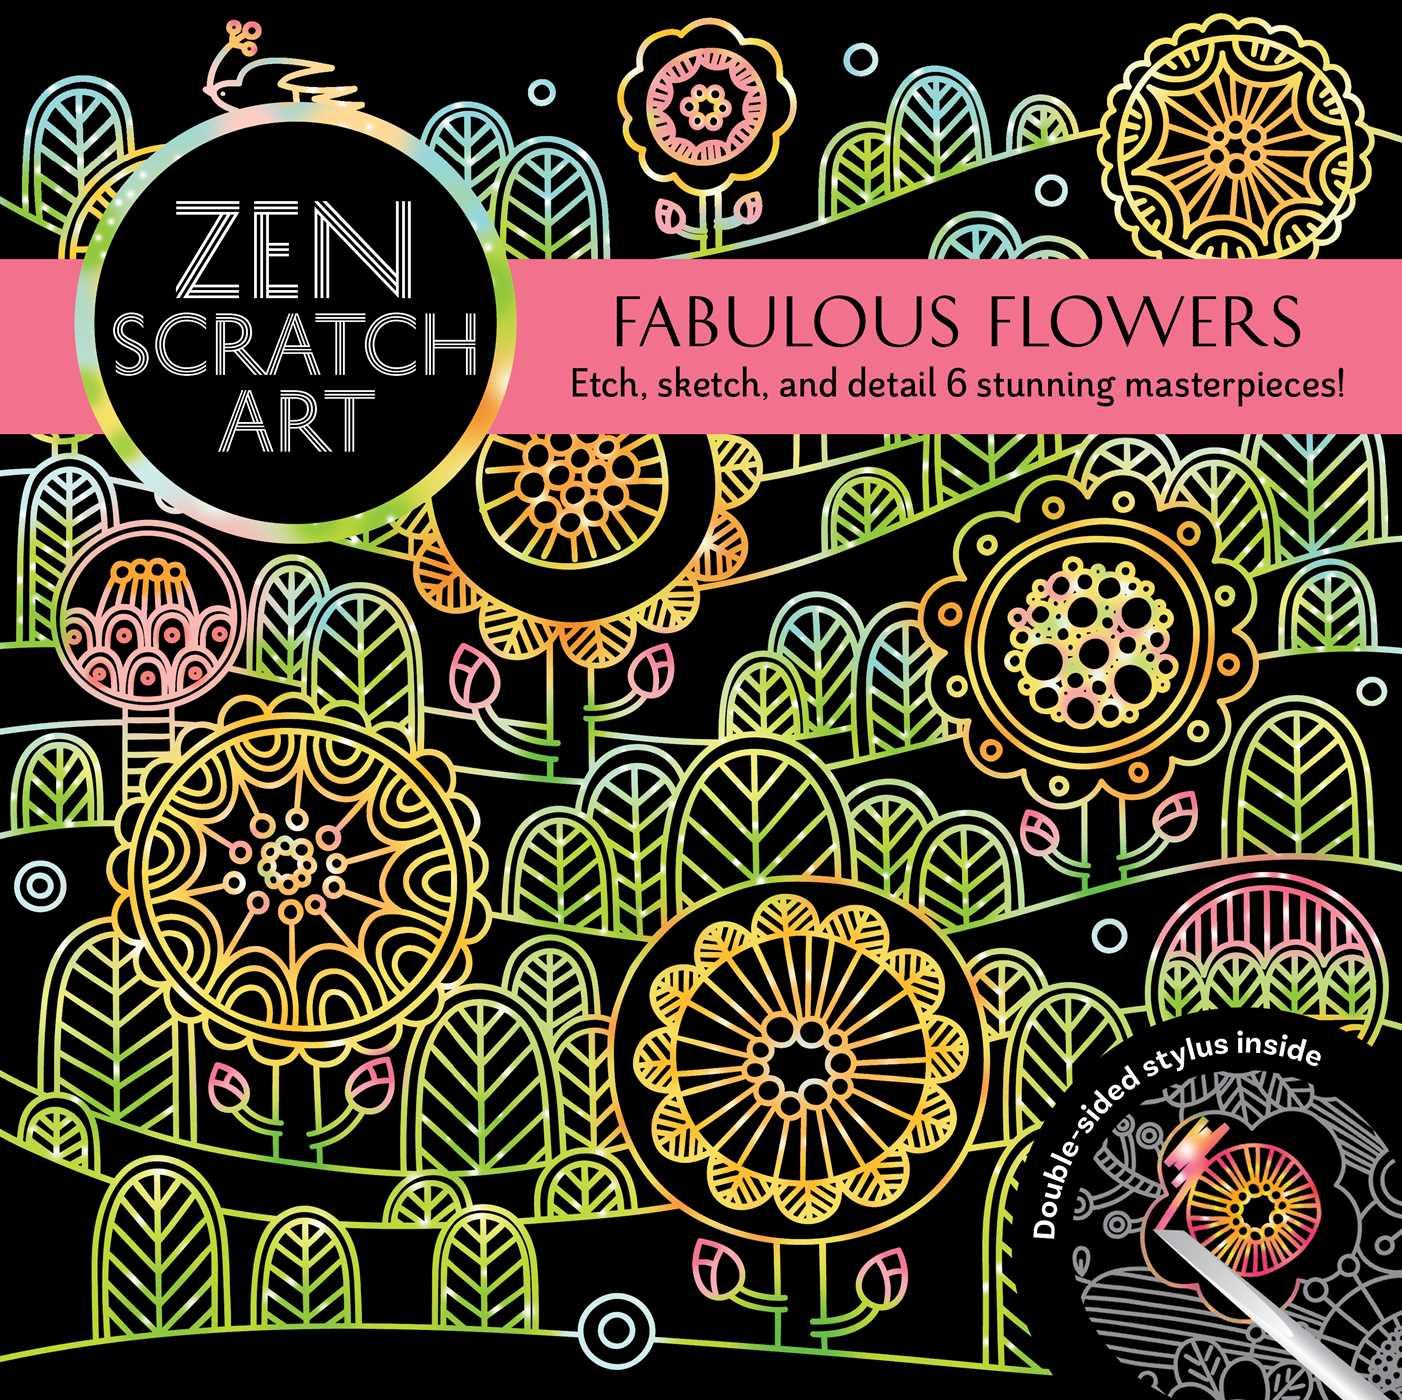 Zen Scratch Art Fabulous Flowers 9784056210750 Hr